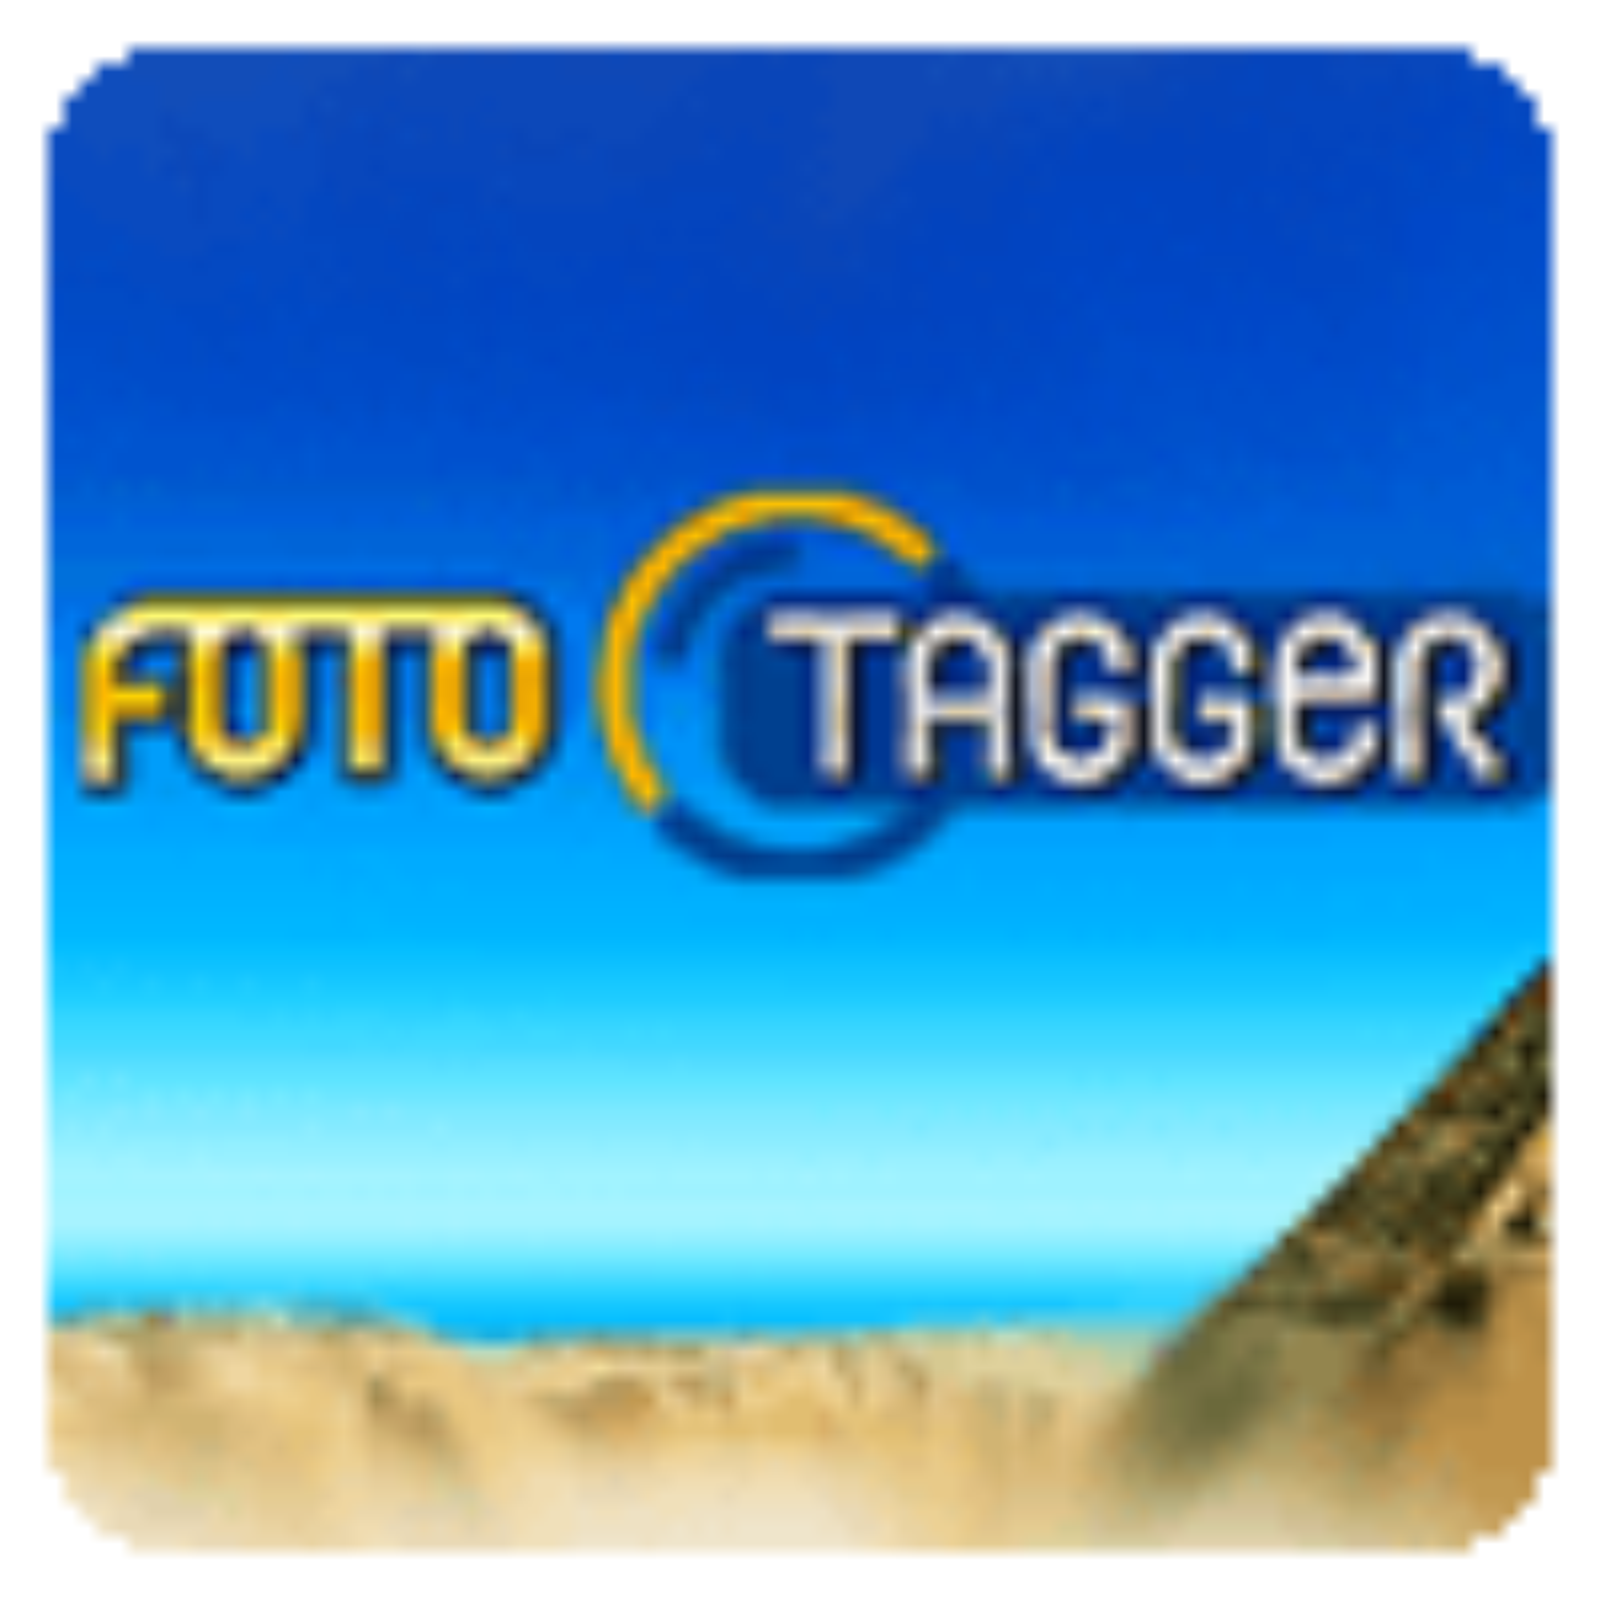 FotoTagger 2.13